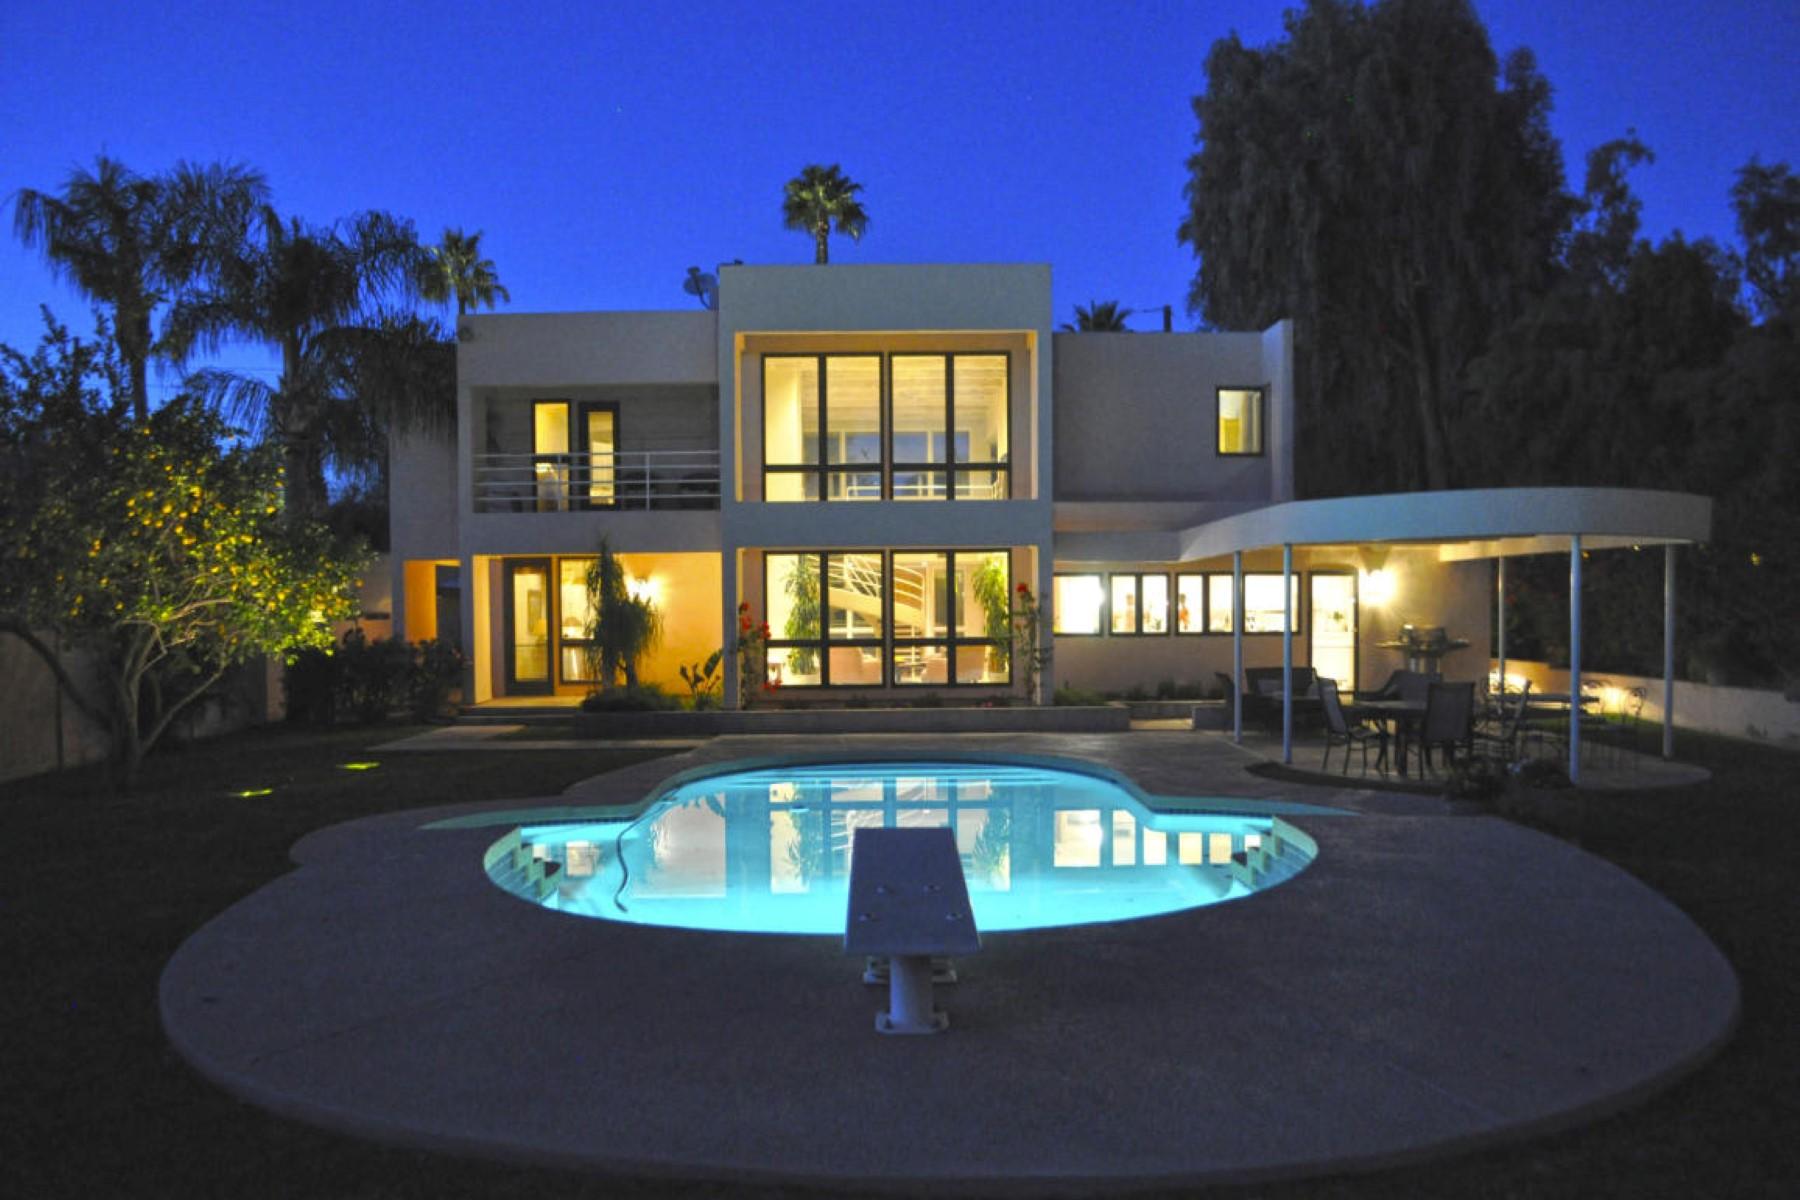 獨棟家庭住宅 為 出售 在 Elegant contemporary home 2045 E Bethany Home Rd Phoenix, 亞利桑那州, 85016 美國